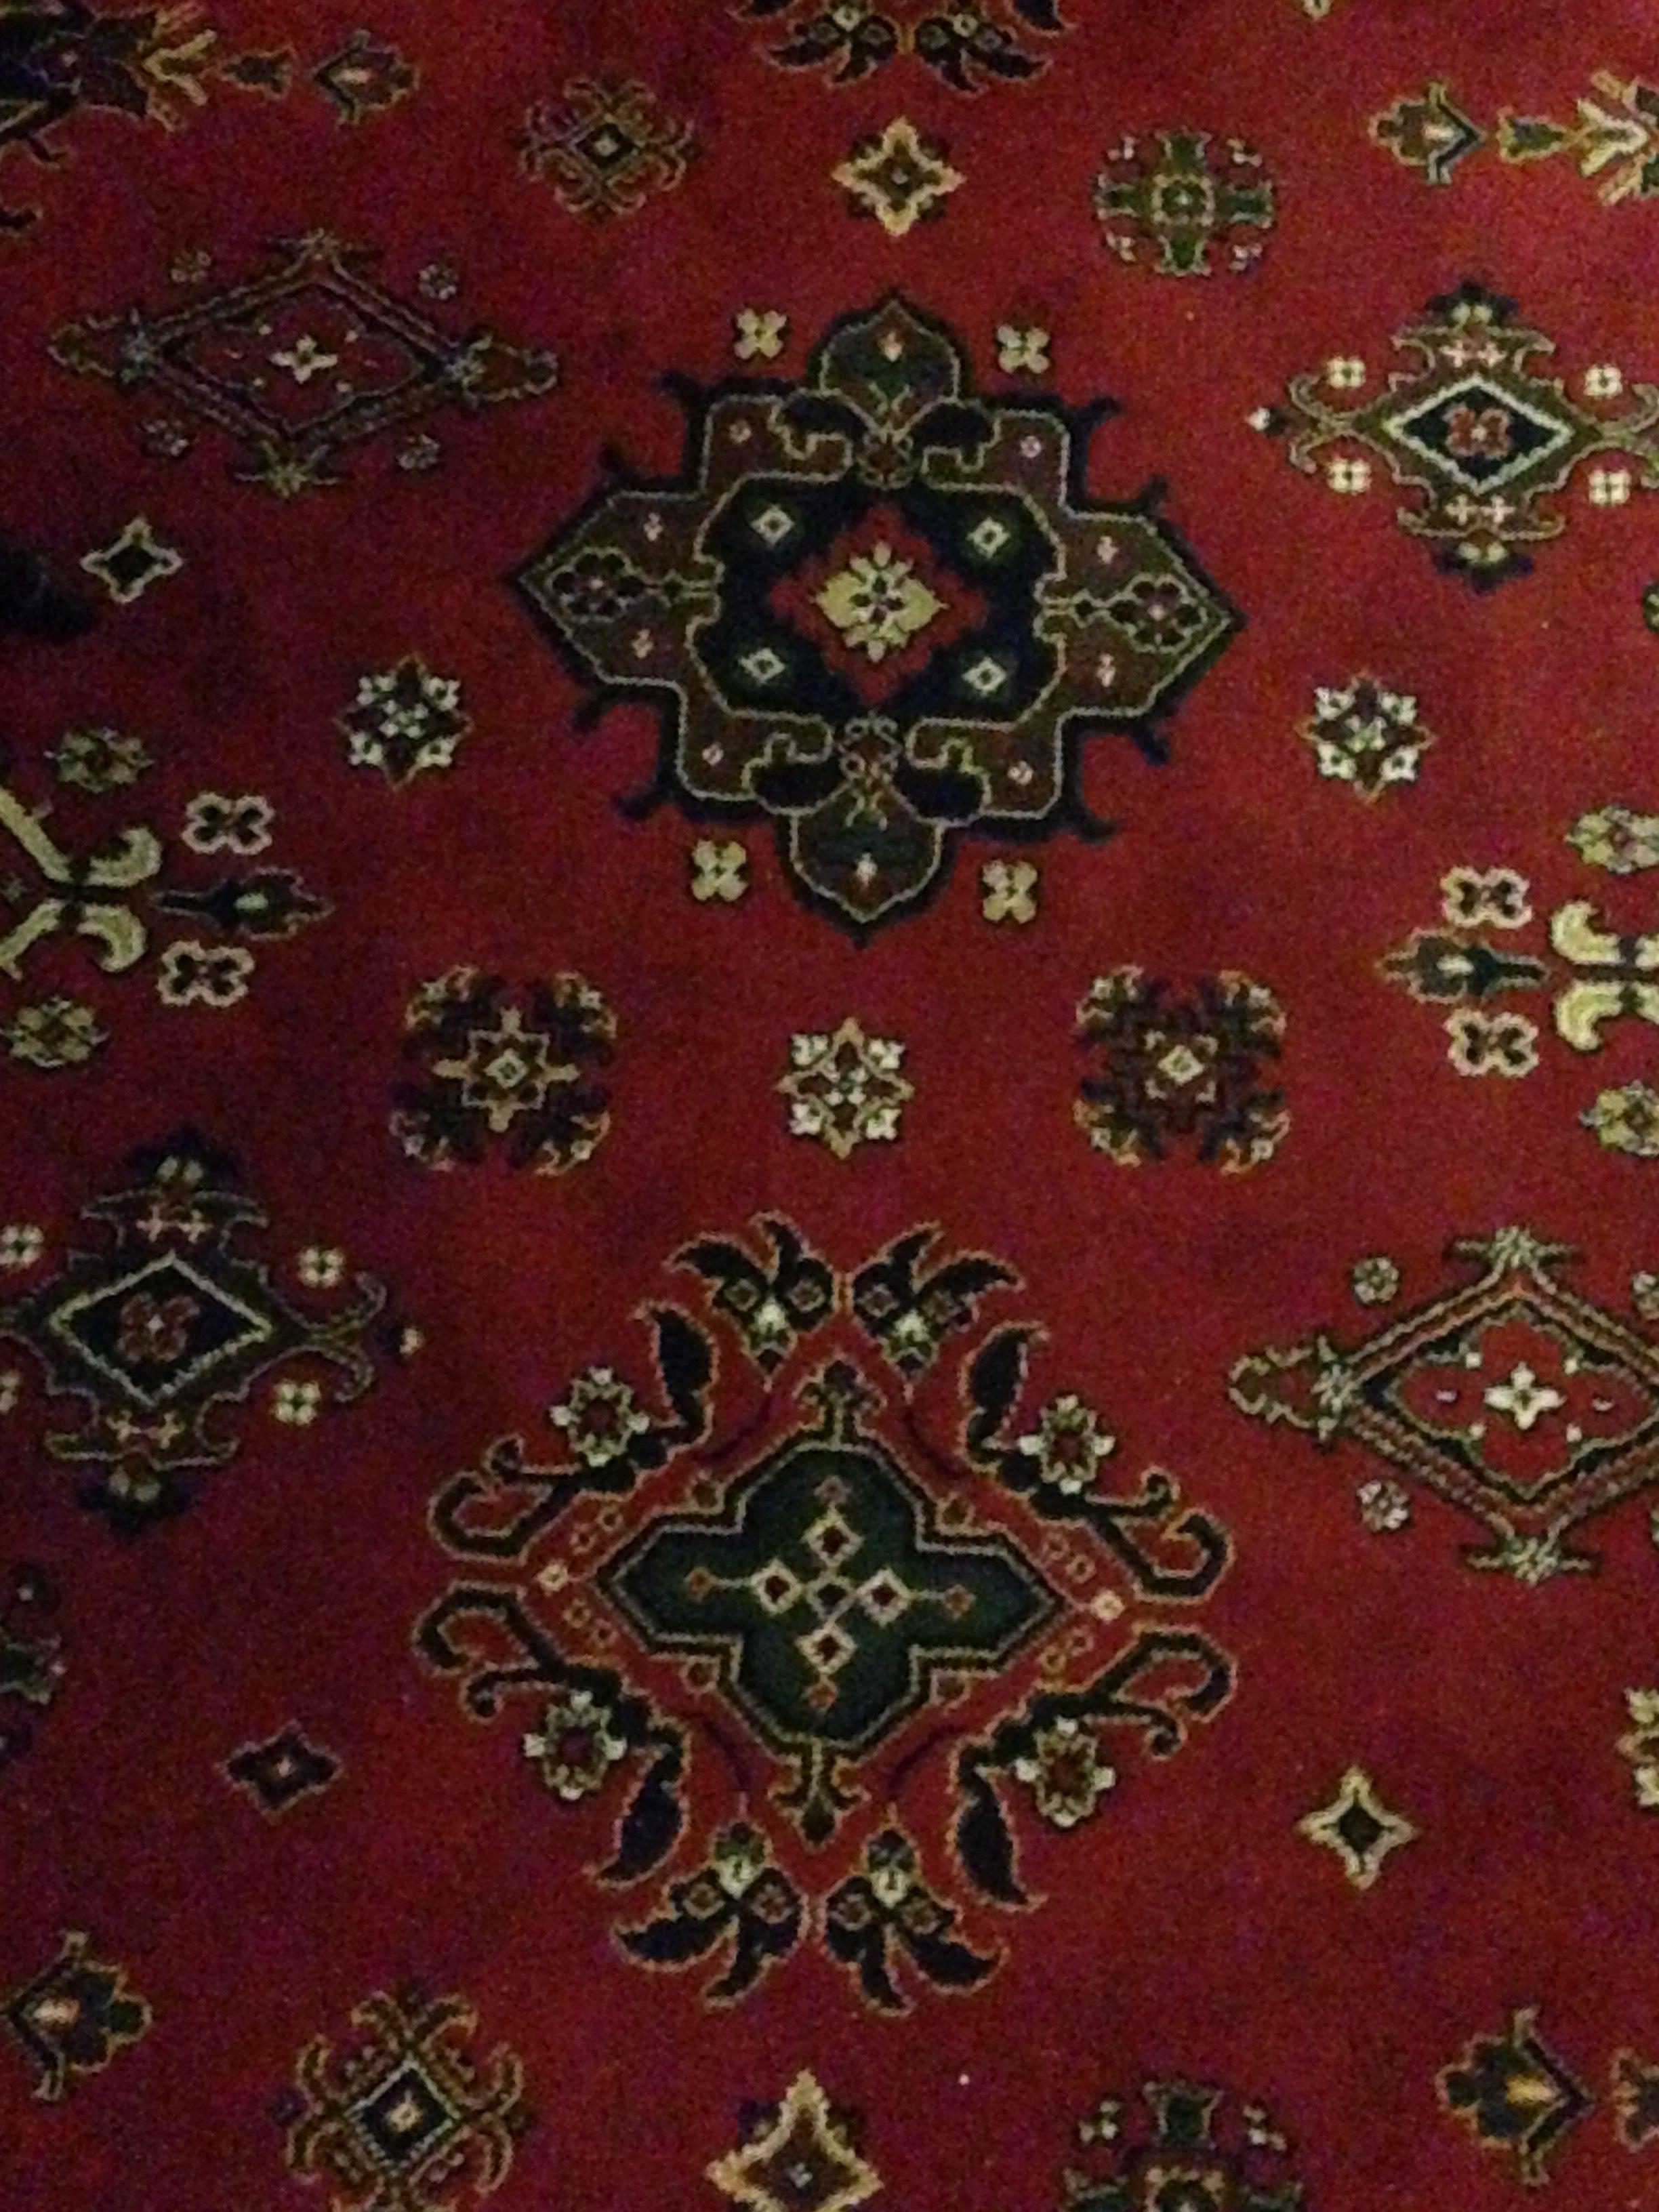 Pub Carpet In The Blue Bell Fossgate York North Yorkshire Typical British British Pub Bluebells